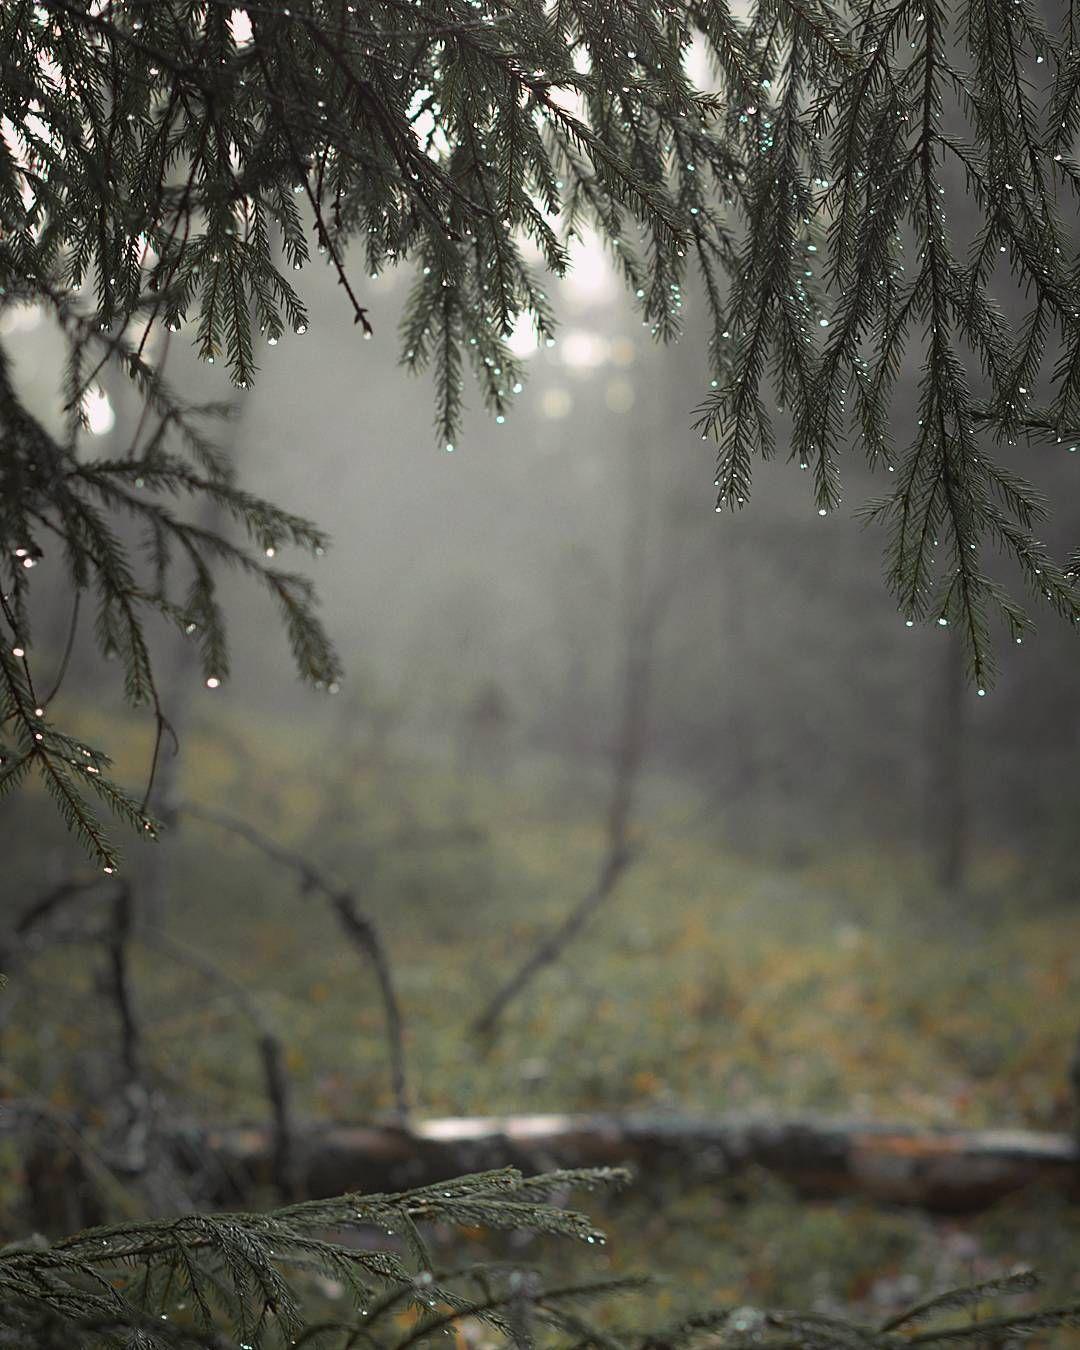 Whiskey Grit Photo Nature Nature Photography Rain Photography